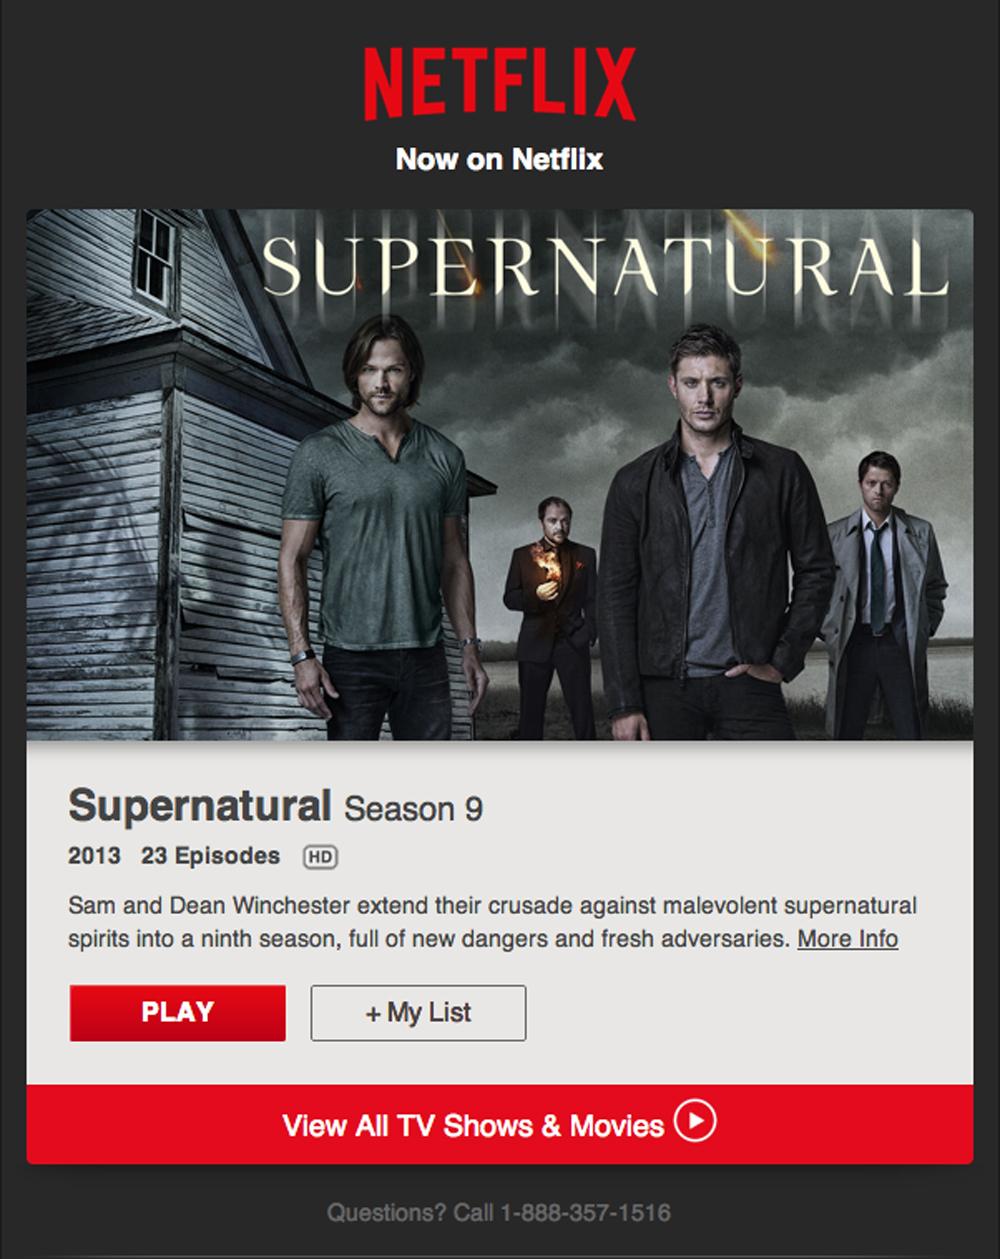 NetflixでSuperNaturalシーズン9が観られます!